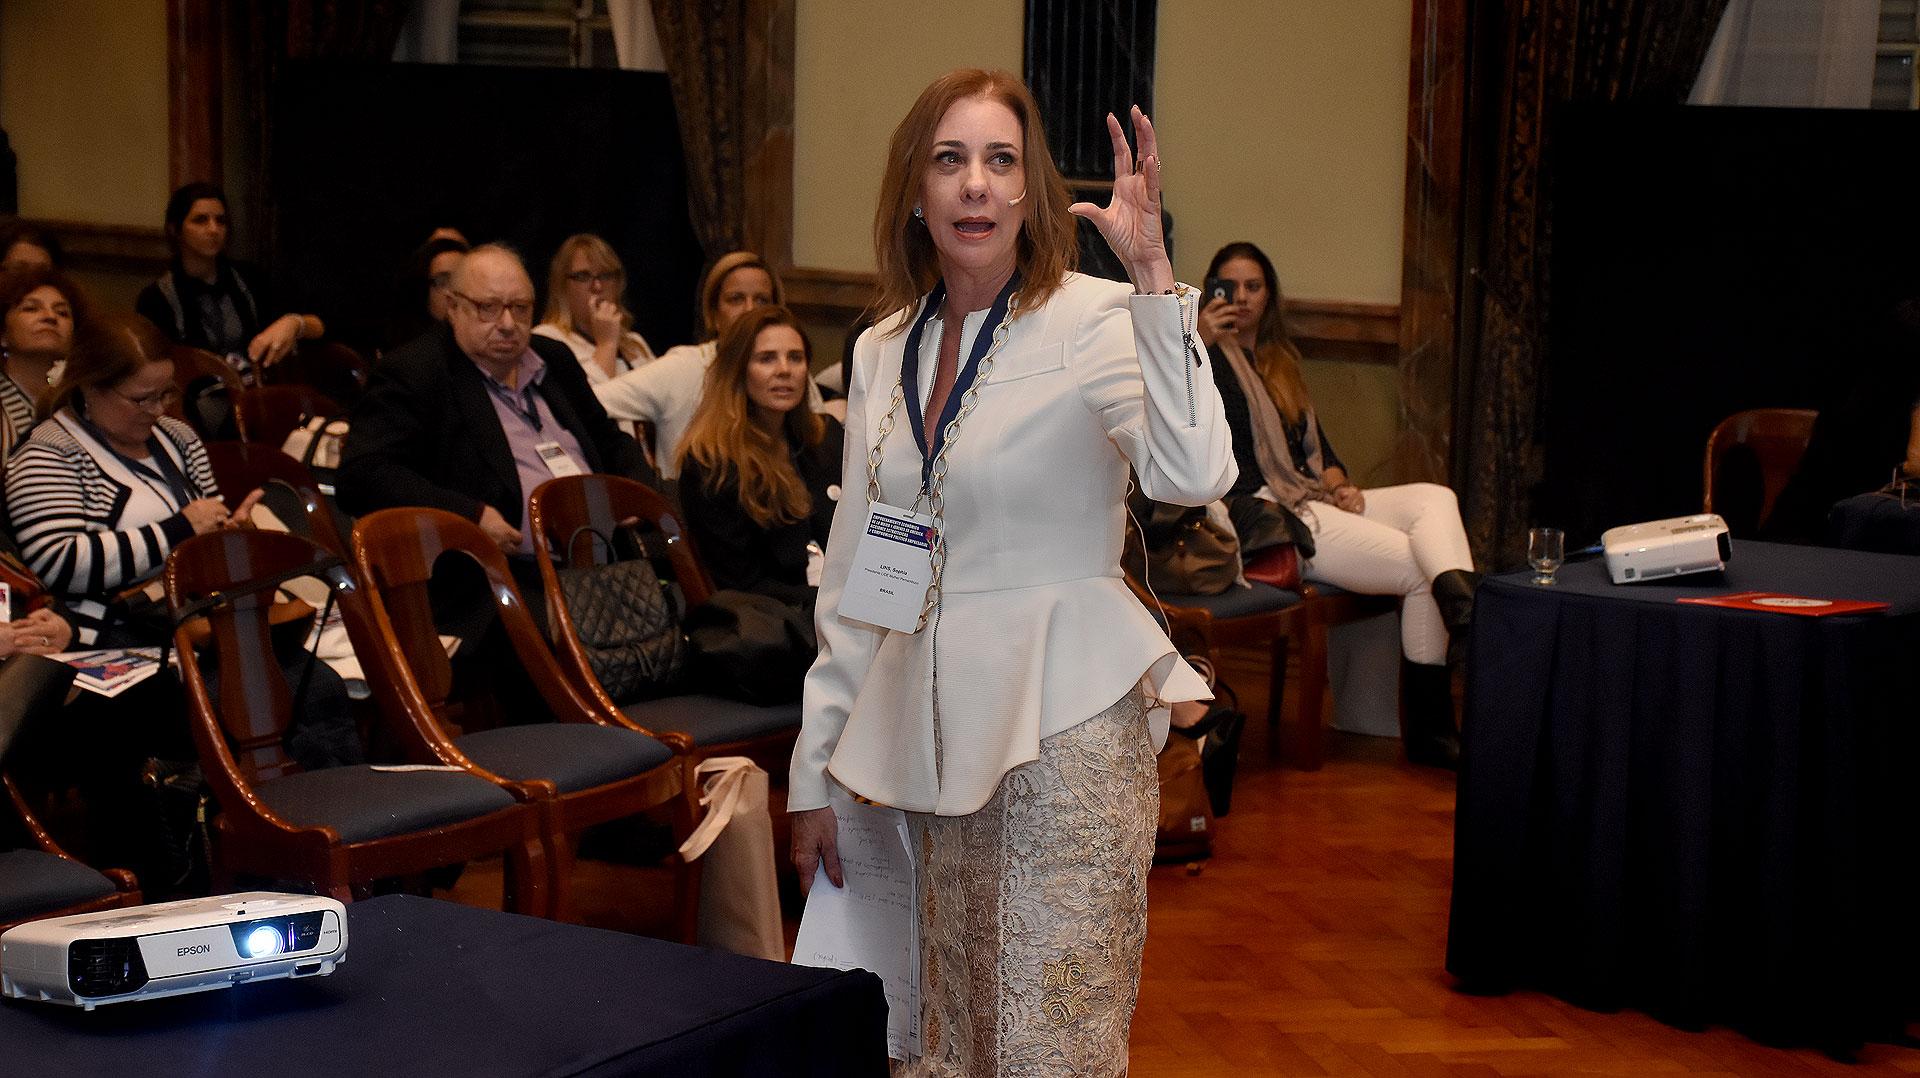 Sophia Lins, presidenta Lide Mulher Pernambuco